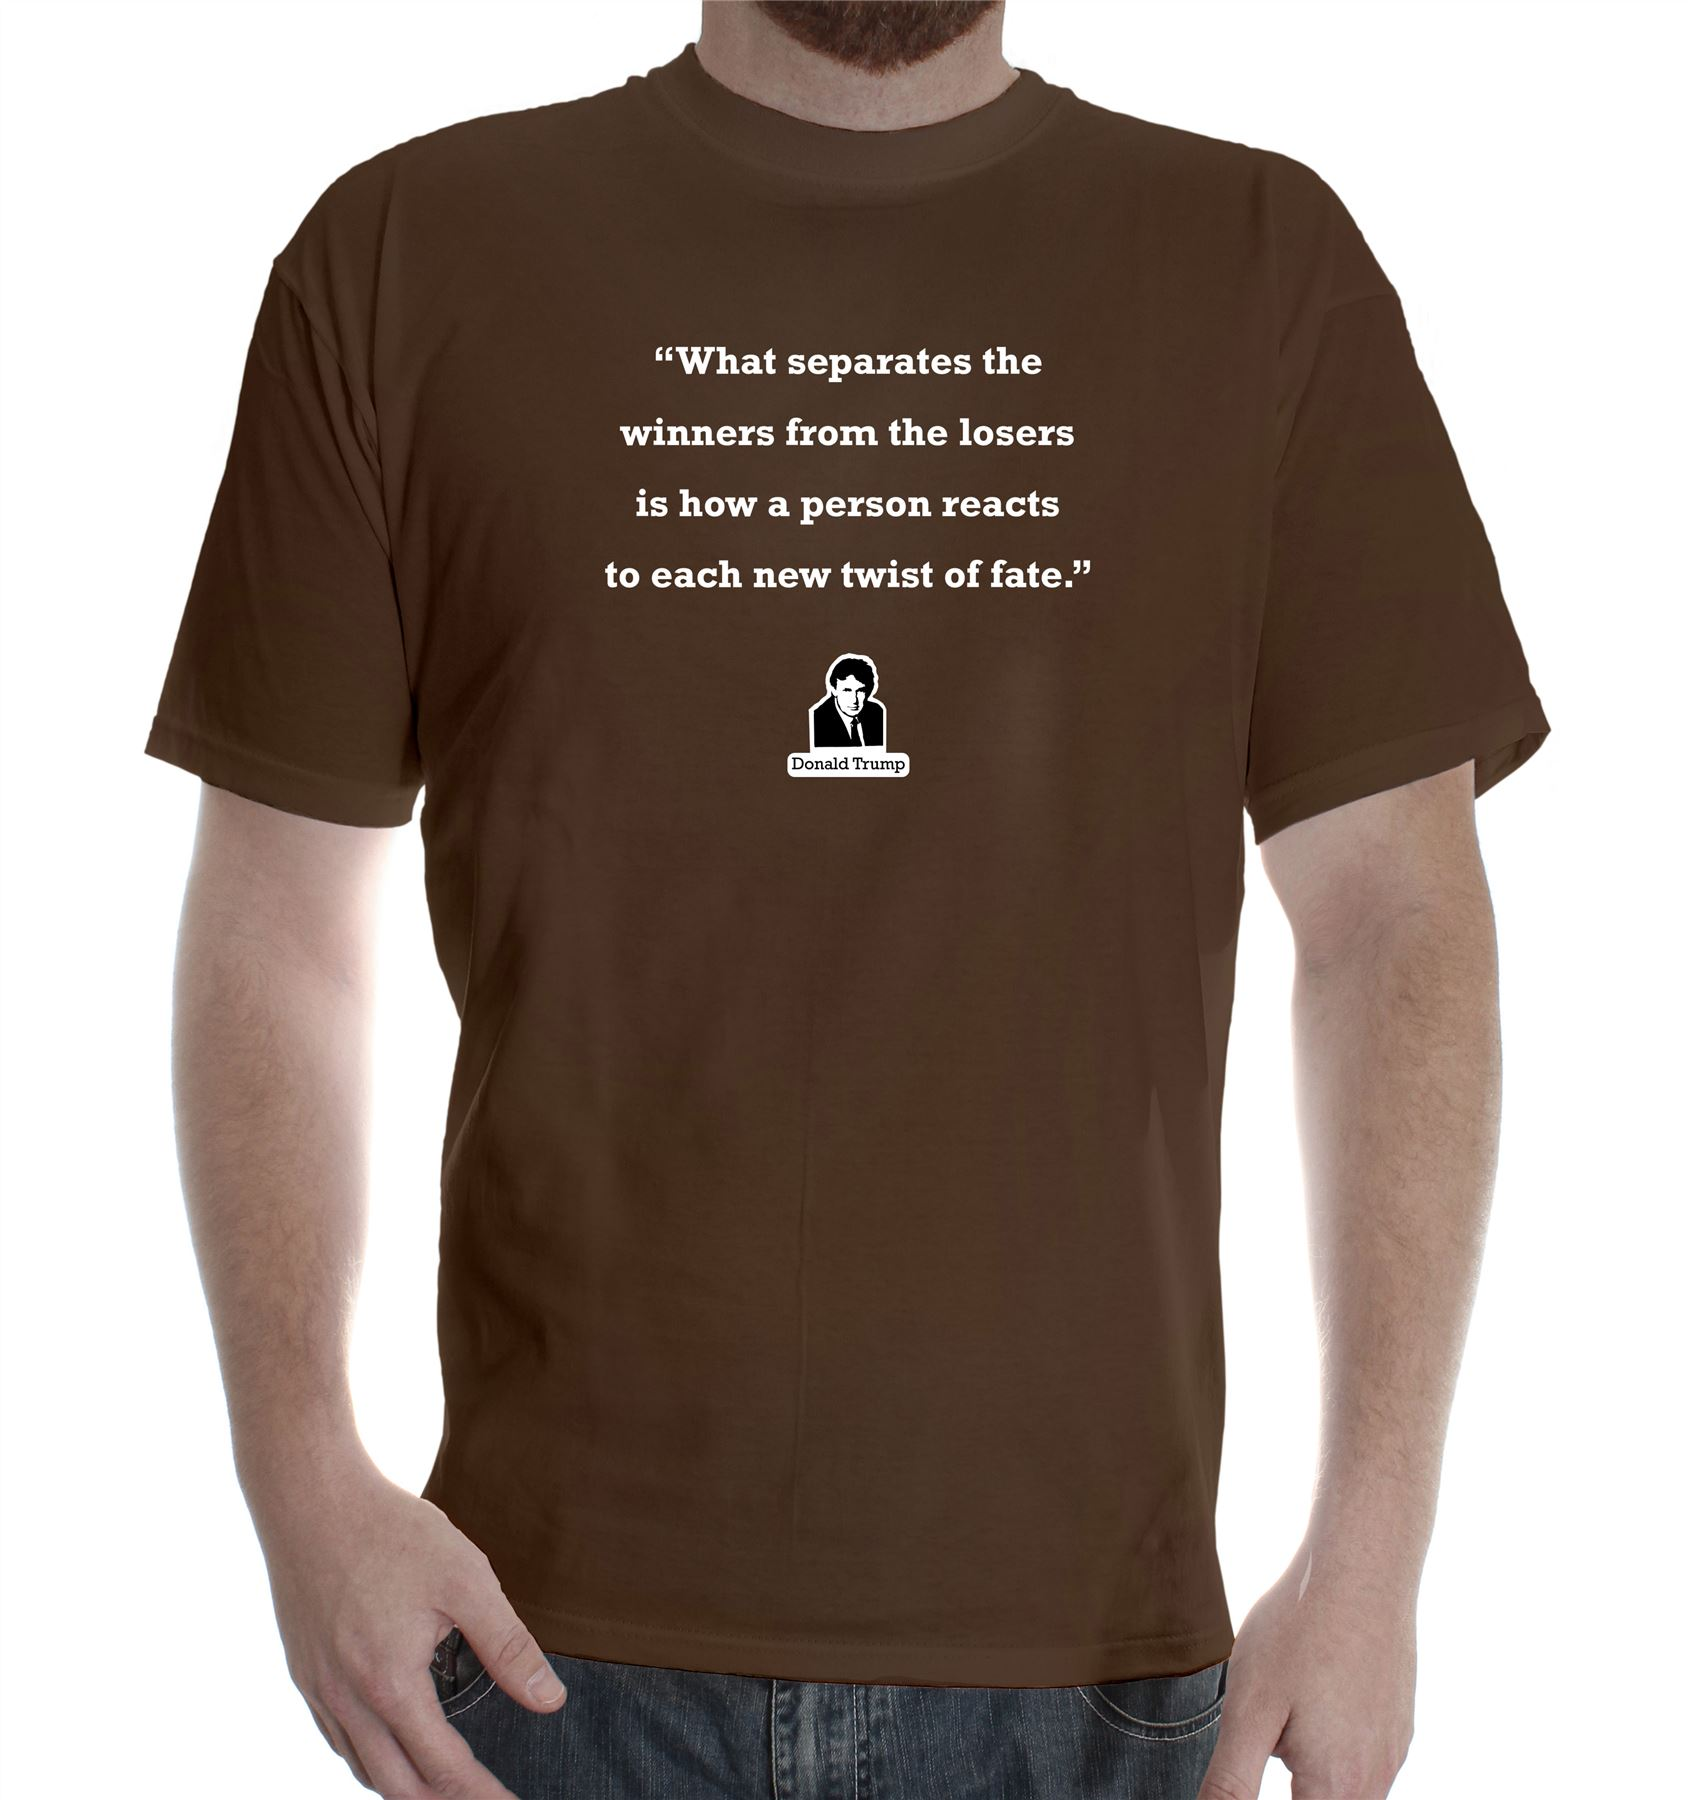 Shirt design new - Mens Printed Cotton T Shirt Tee Shirts Design